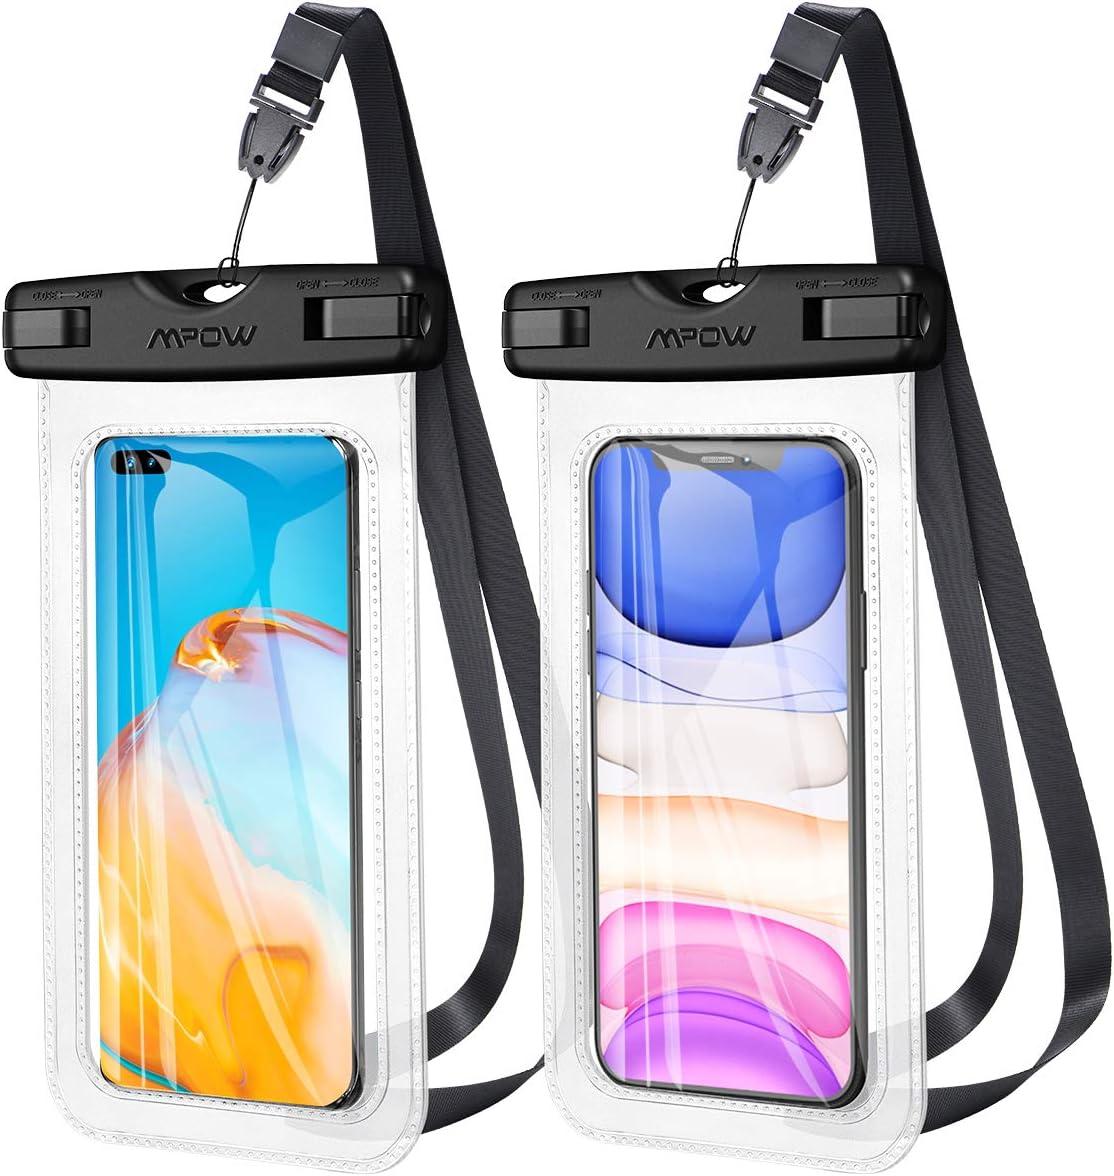 Mpow Funda Impermeable Universal-2 Unidades, Bolsa para Móvil Estanca a Prueba de Agua IPX8 para iPhone XS MAX/XR/XS/X/8/ 8plus/7 Samsung Galaxy s9+/S10Plus / S10 Huawei P30 Pro / P30, Pantalla táctil: Amazon.es: